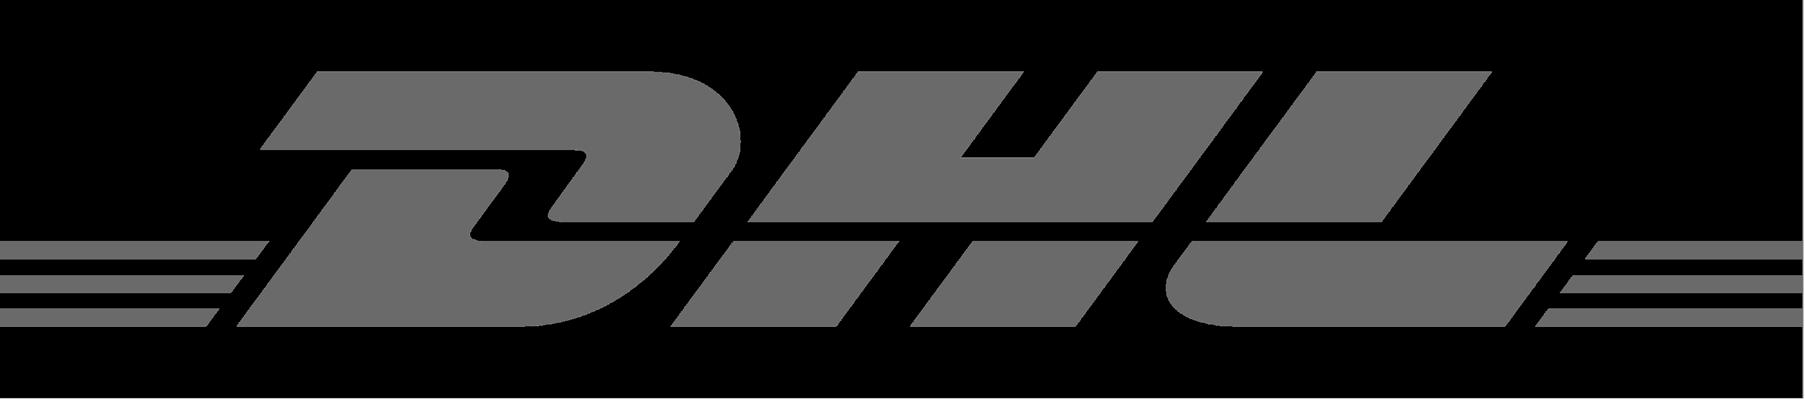 dhl-logo-